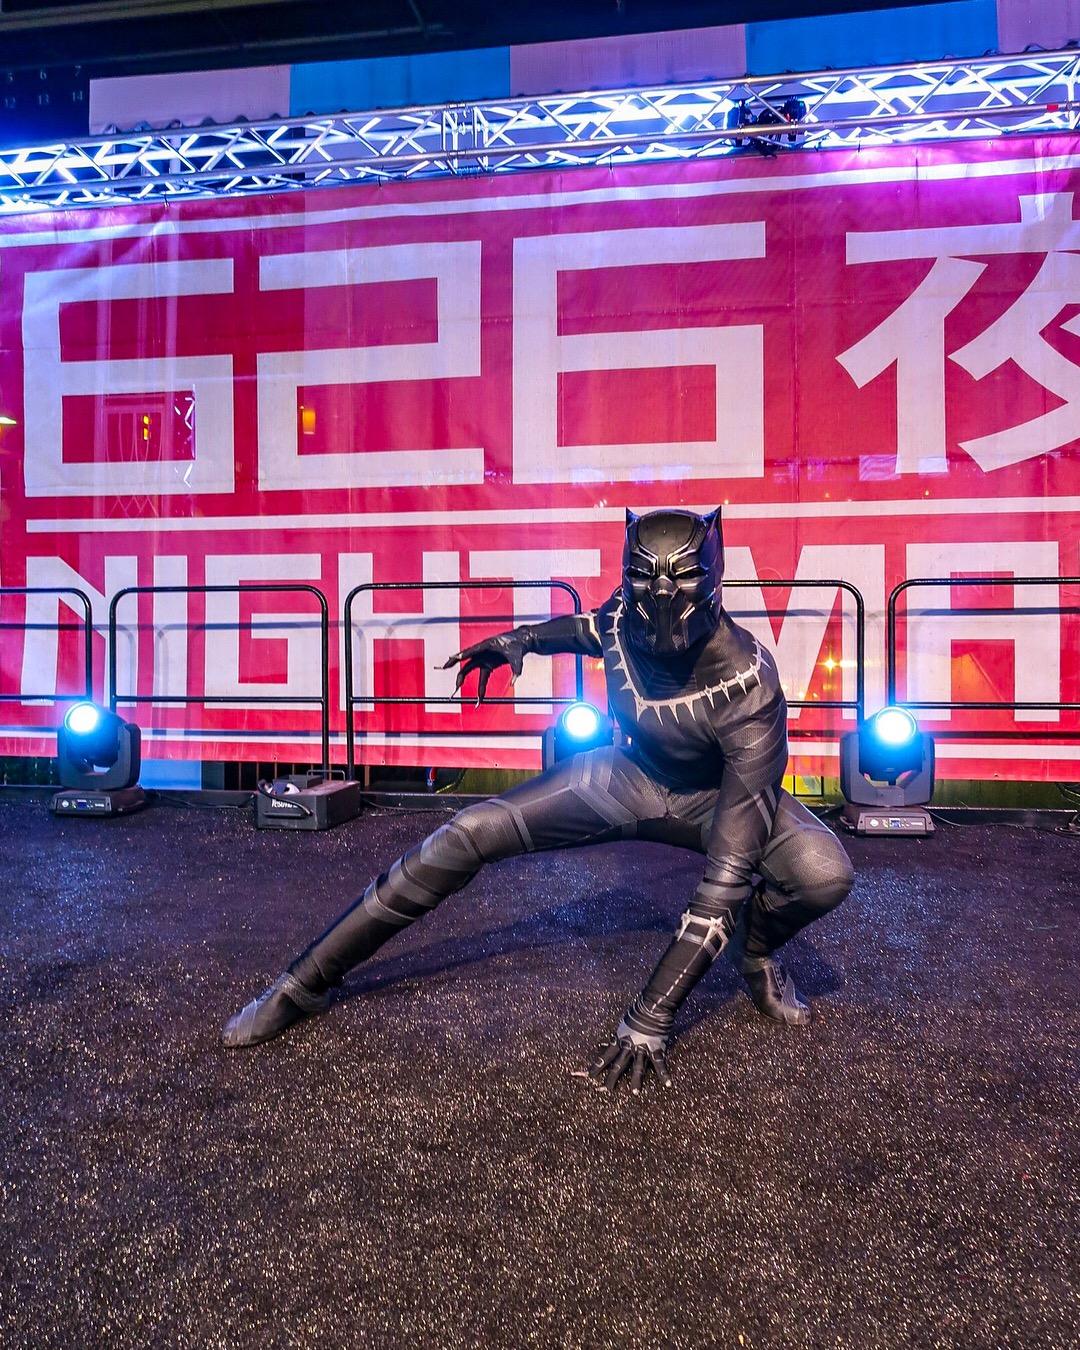 626-night-market-cosplay-contest-black-panther.JPG